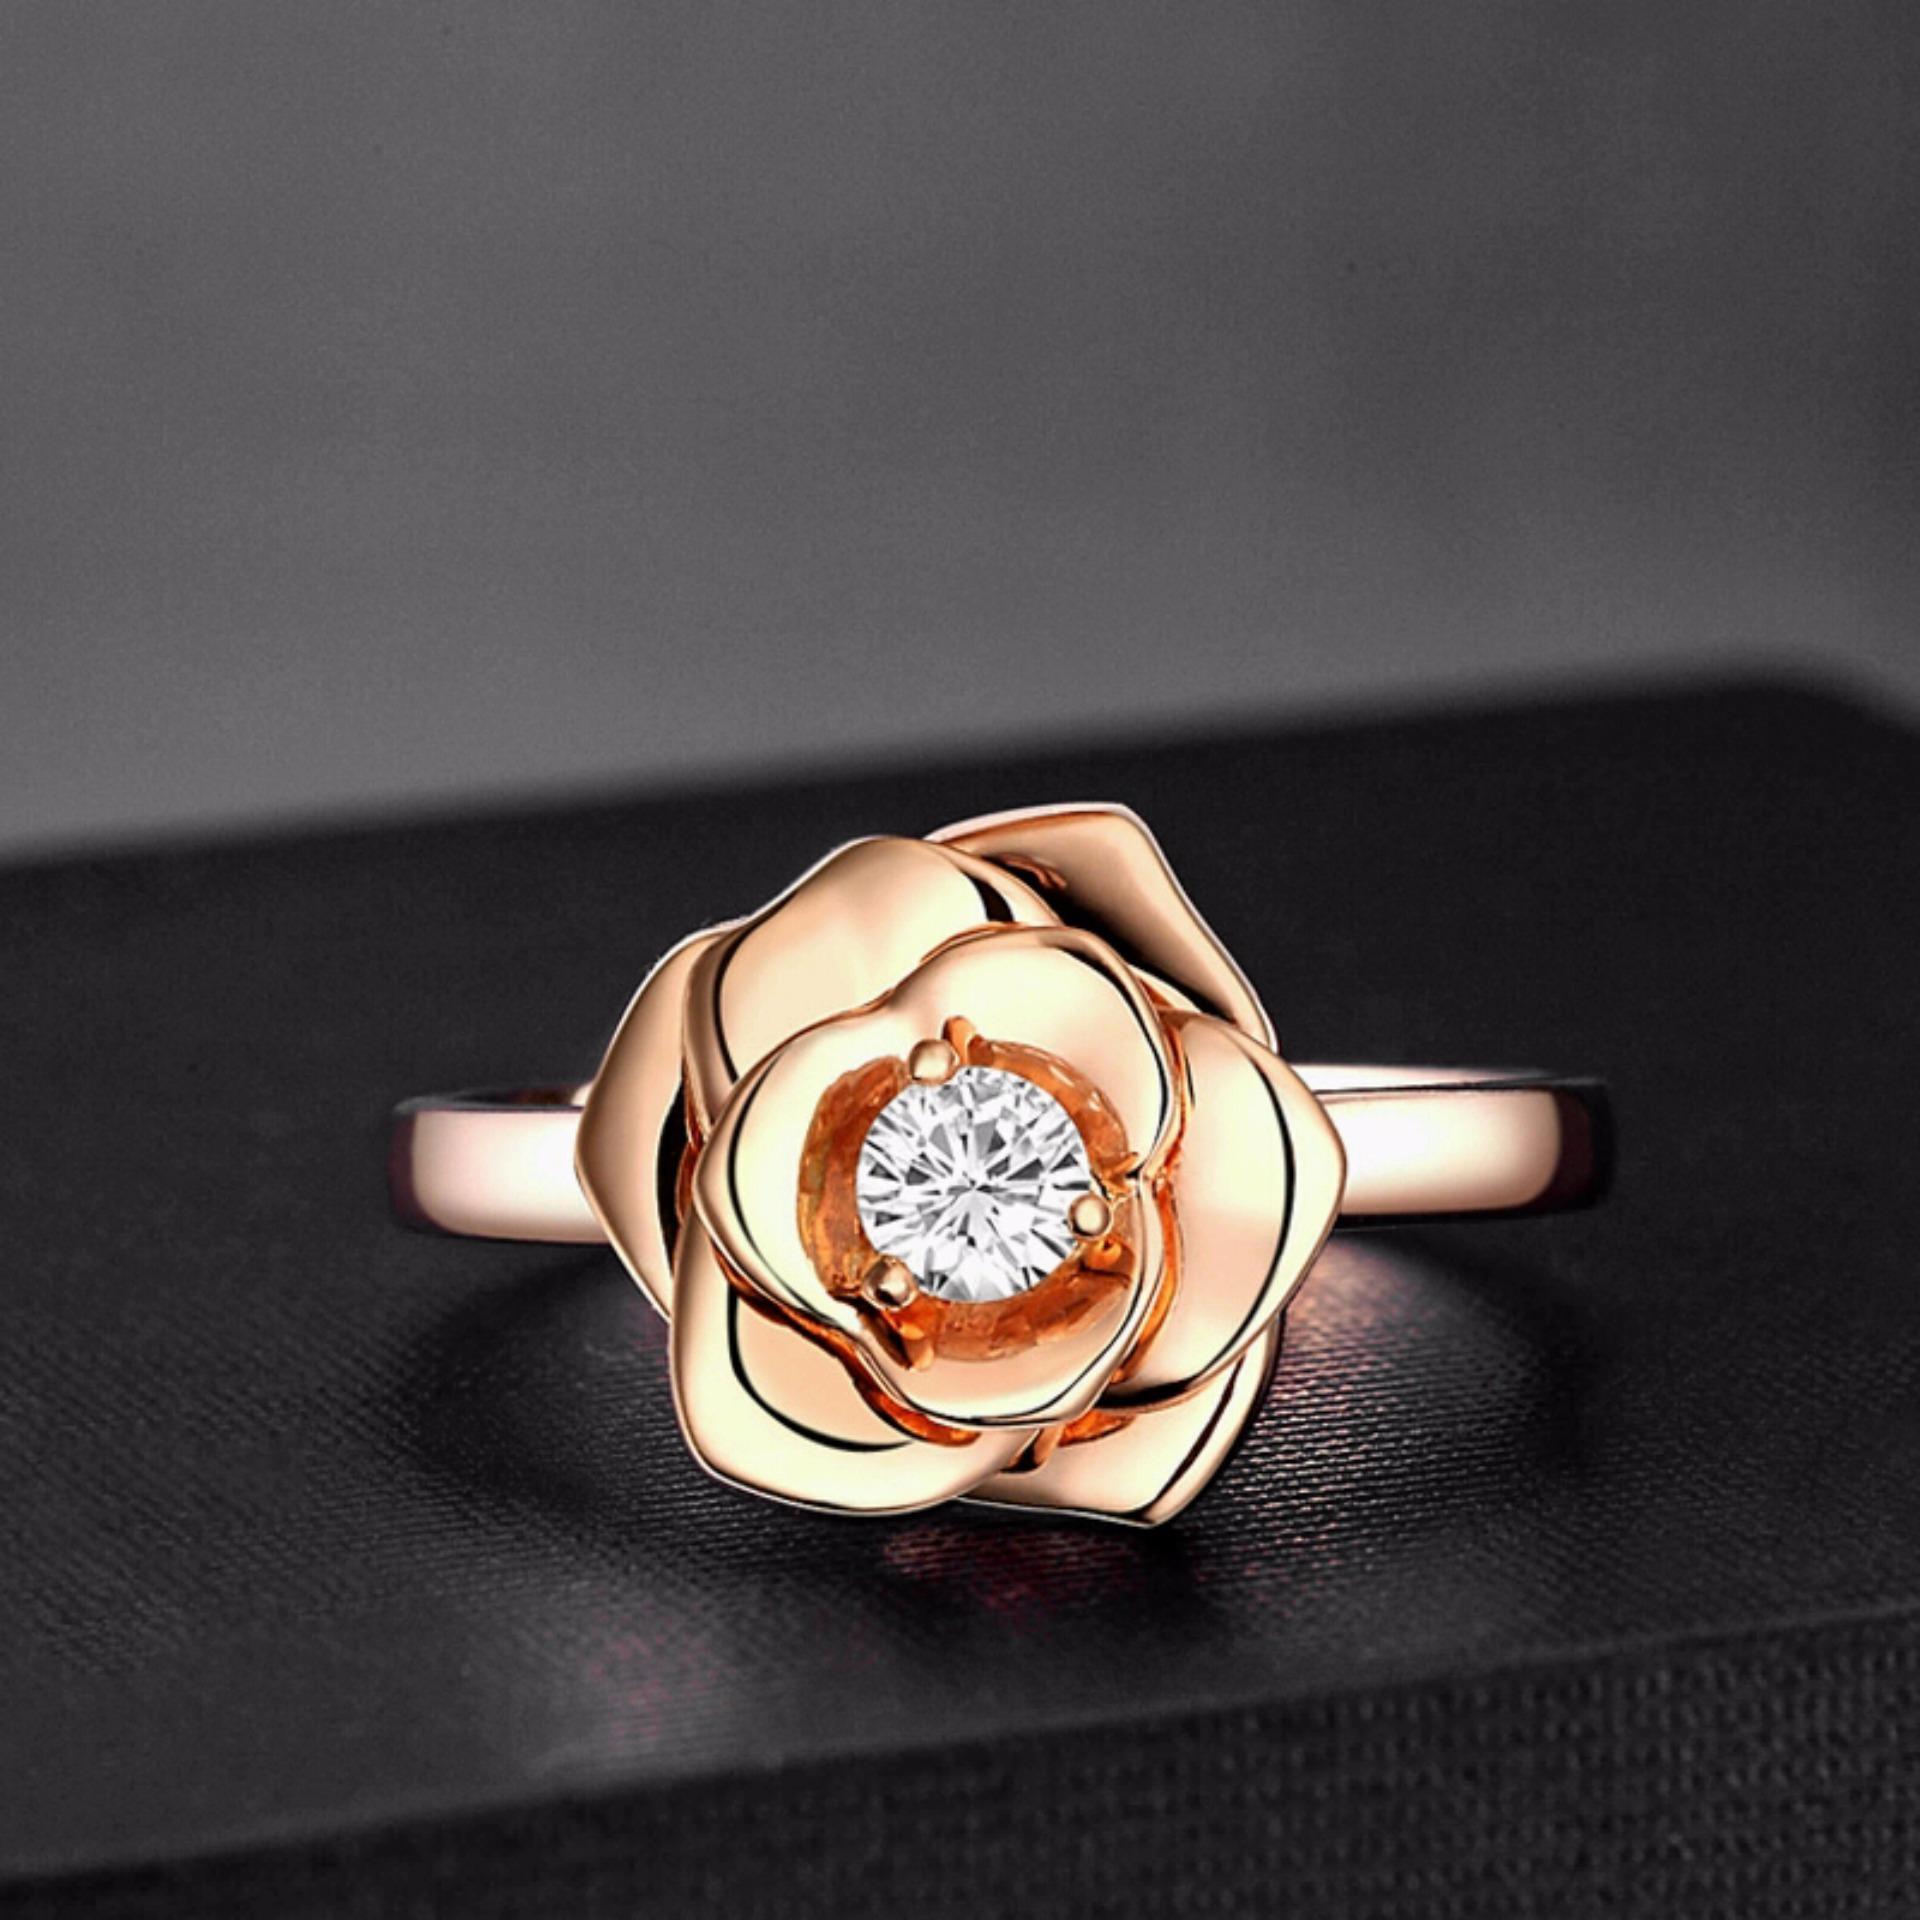 Tiaria Resplendent Rose Pendant Liontin Zircon Dan Emas 9k Daftar Dhtxdfj047 Perhiasan Cincin Putih White Gold Ring Tunangan Wanita With